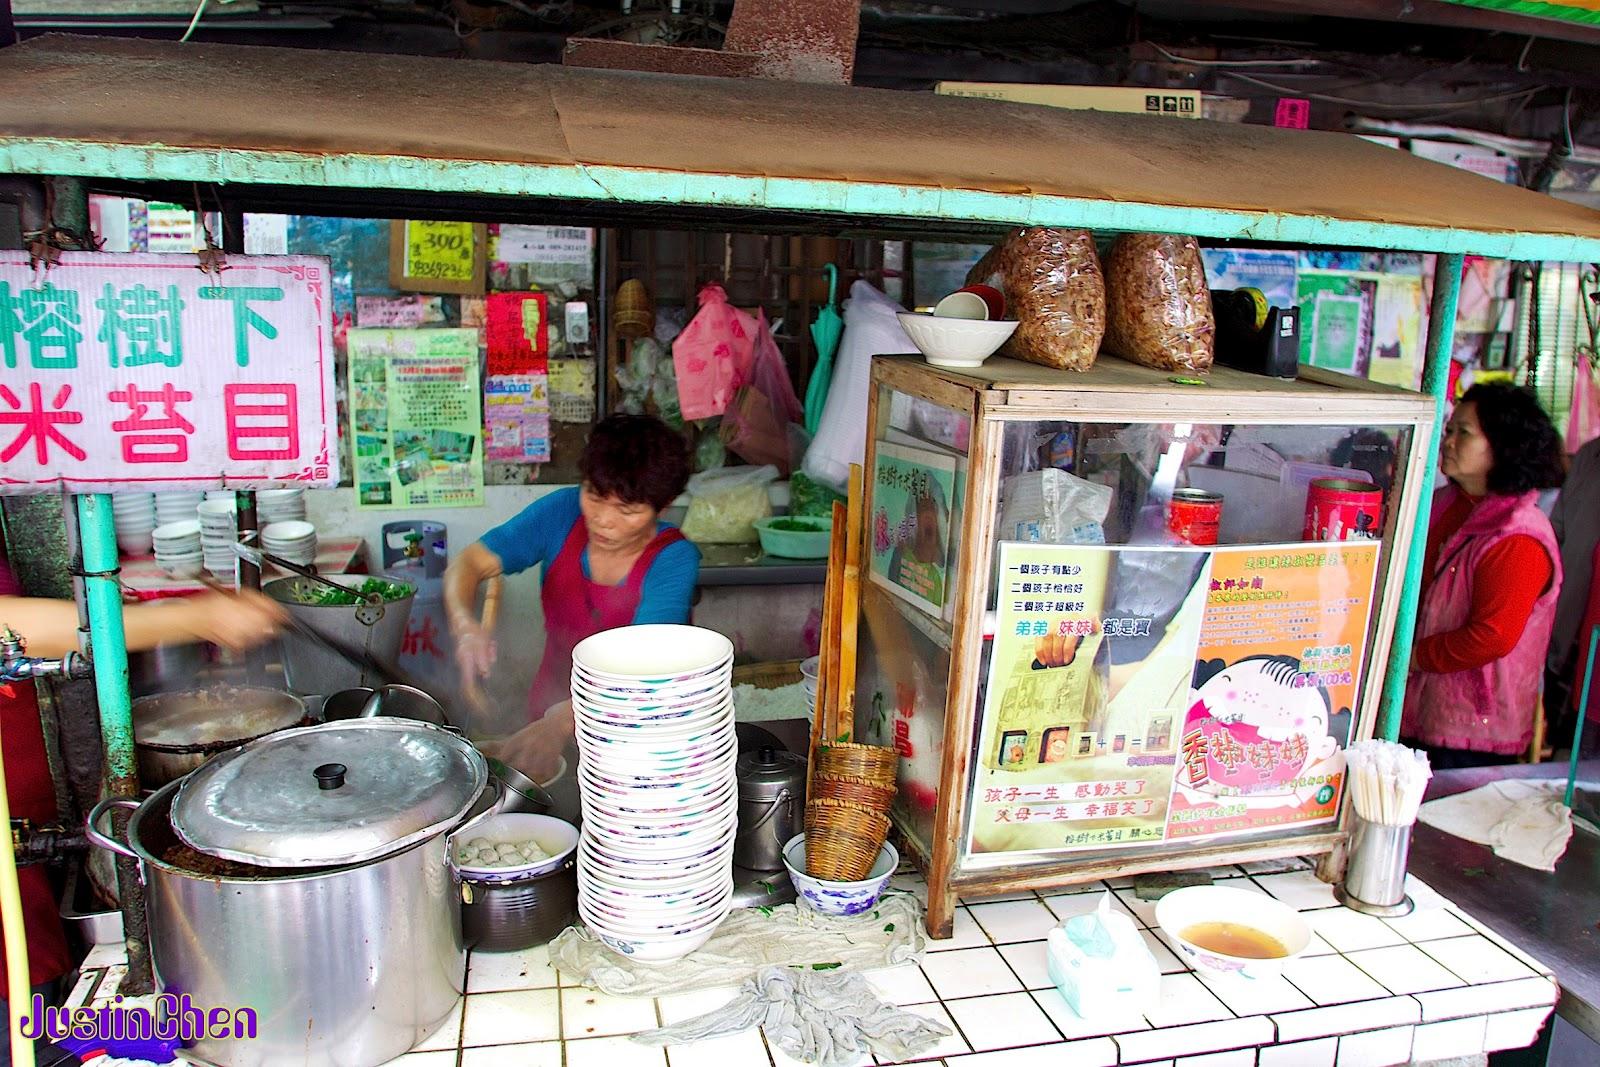 Justin & Jacqui: [美食] 風雨中的臺東市『榕樹下米苔目』